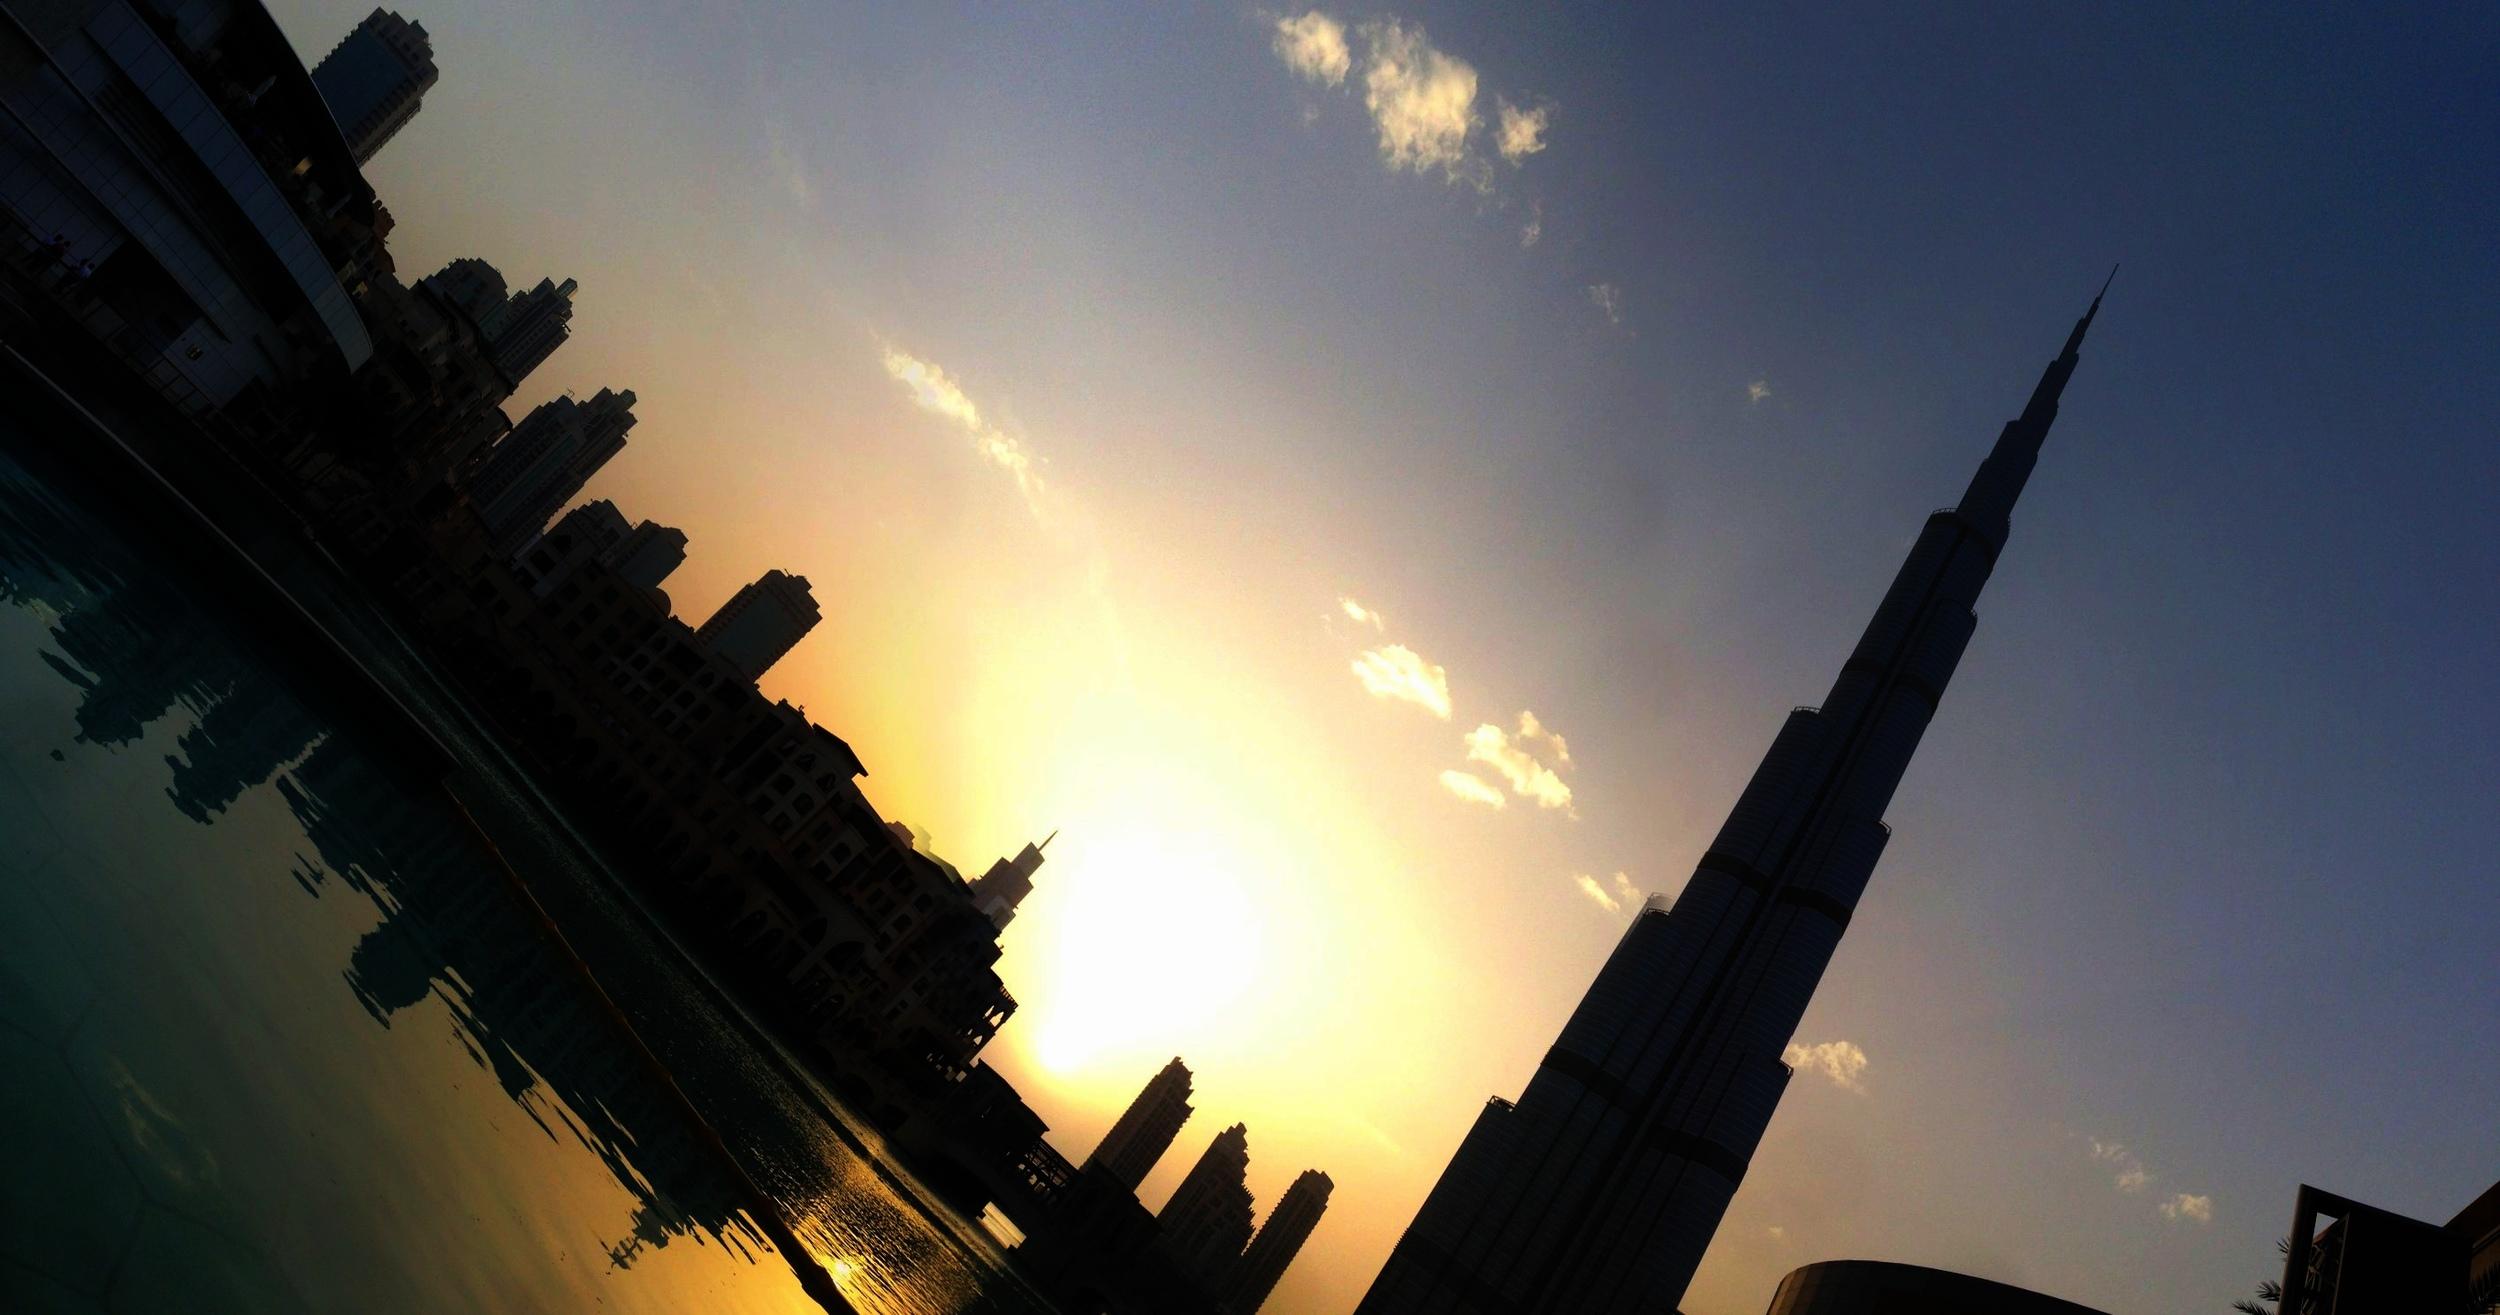 Burj Khalifa, Dubai, Tallest building in the world